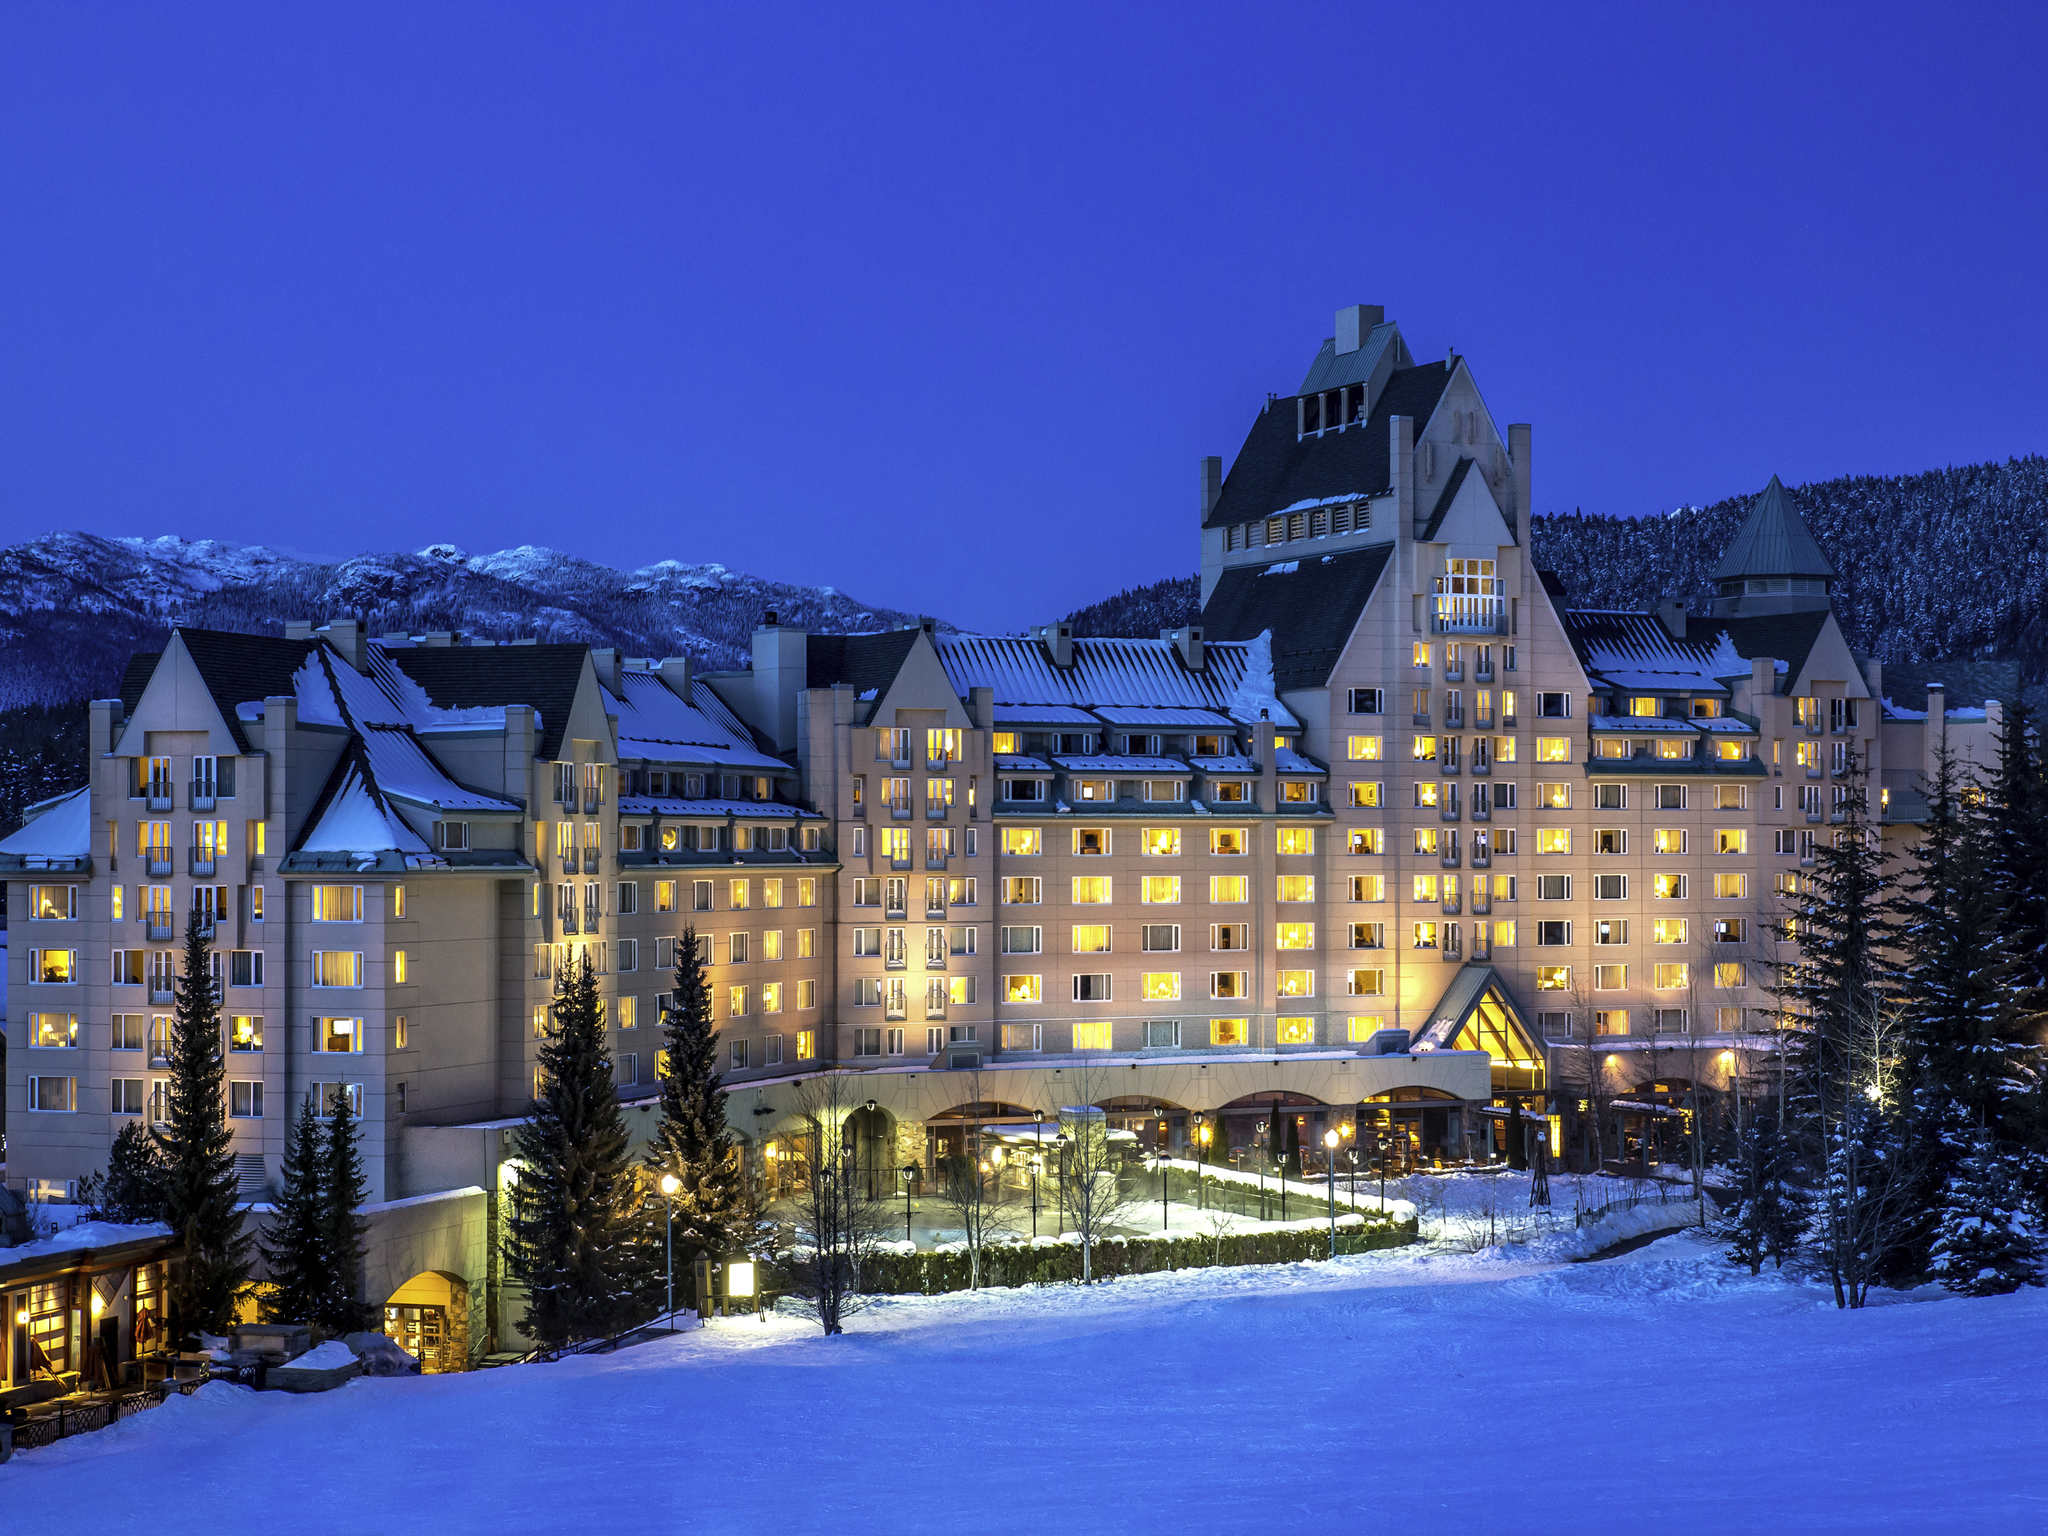 Hotel - Fairmont Château Whistler